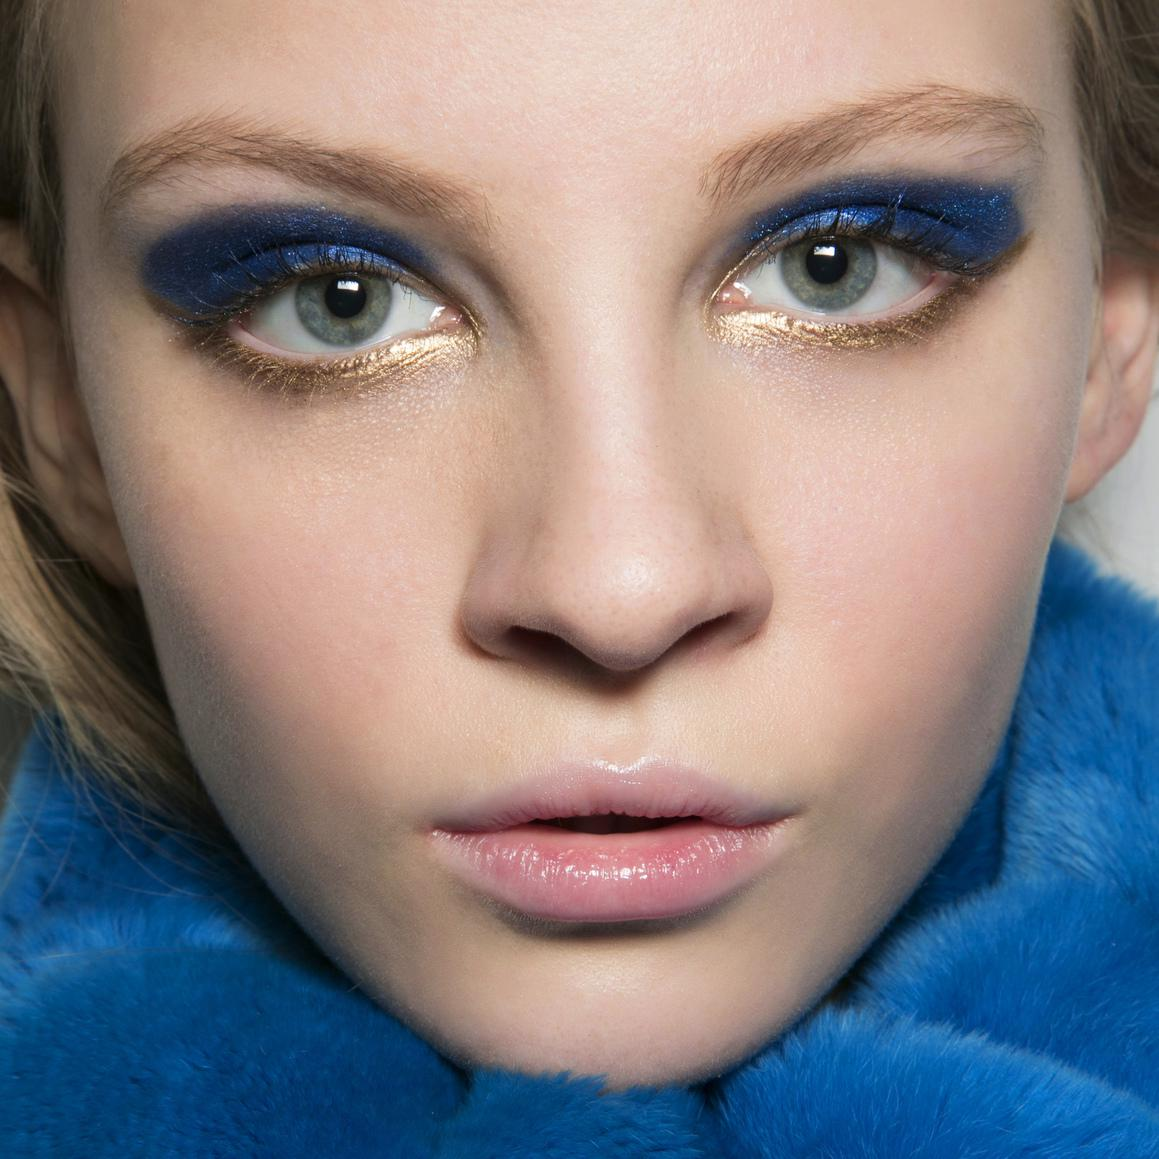 maquillage bleu or notre tuto pour r aliser un maquillage bleu or elle. Black Bedroom Furniture Sets. Home Design Ideas